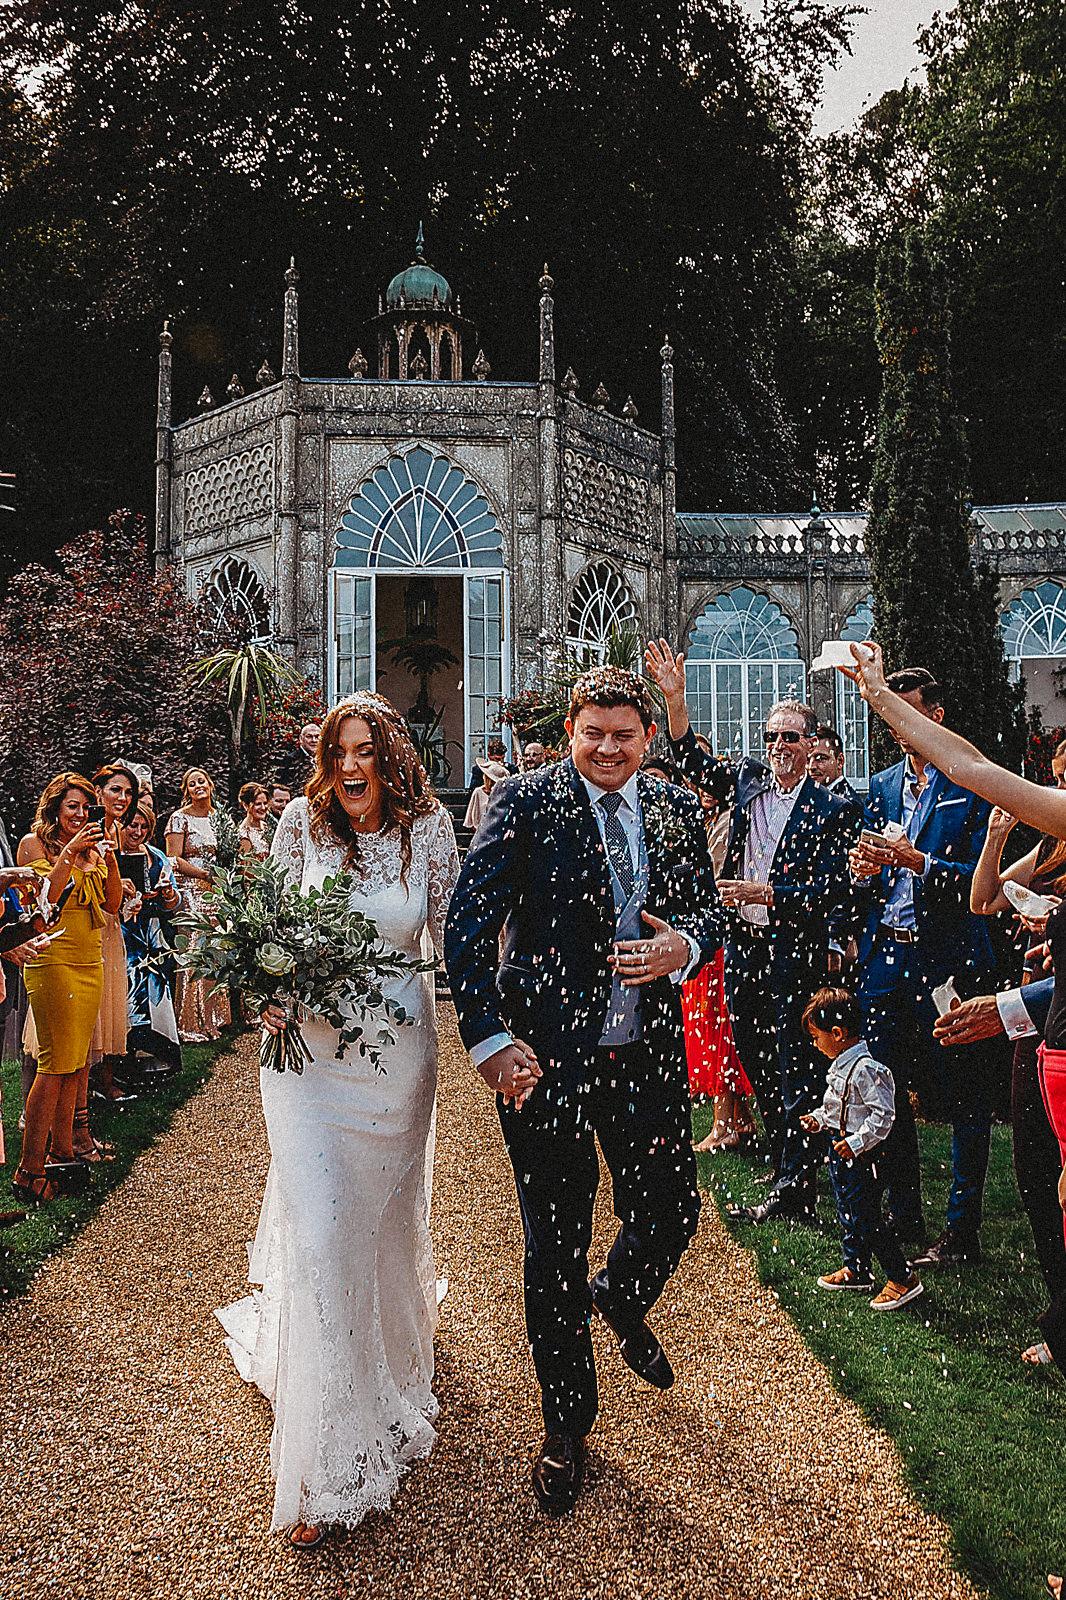 Sezincote House wedding confetti bride and groom